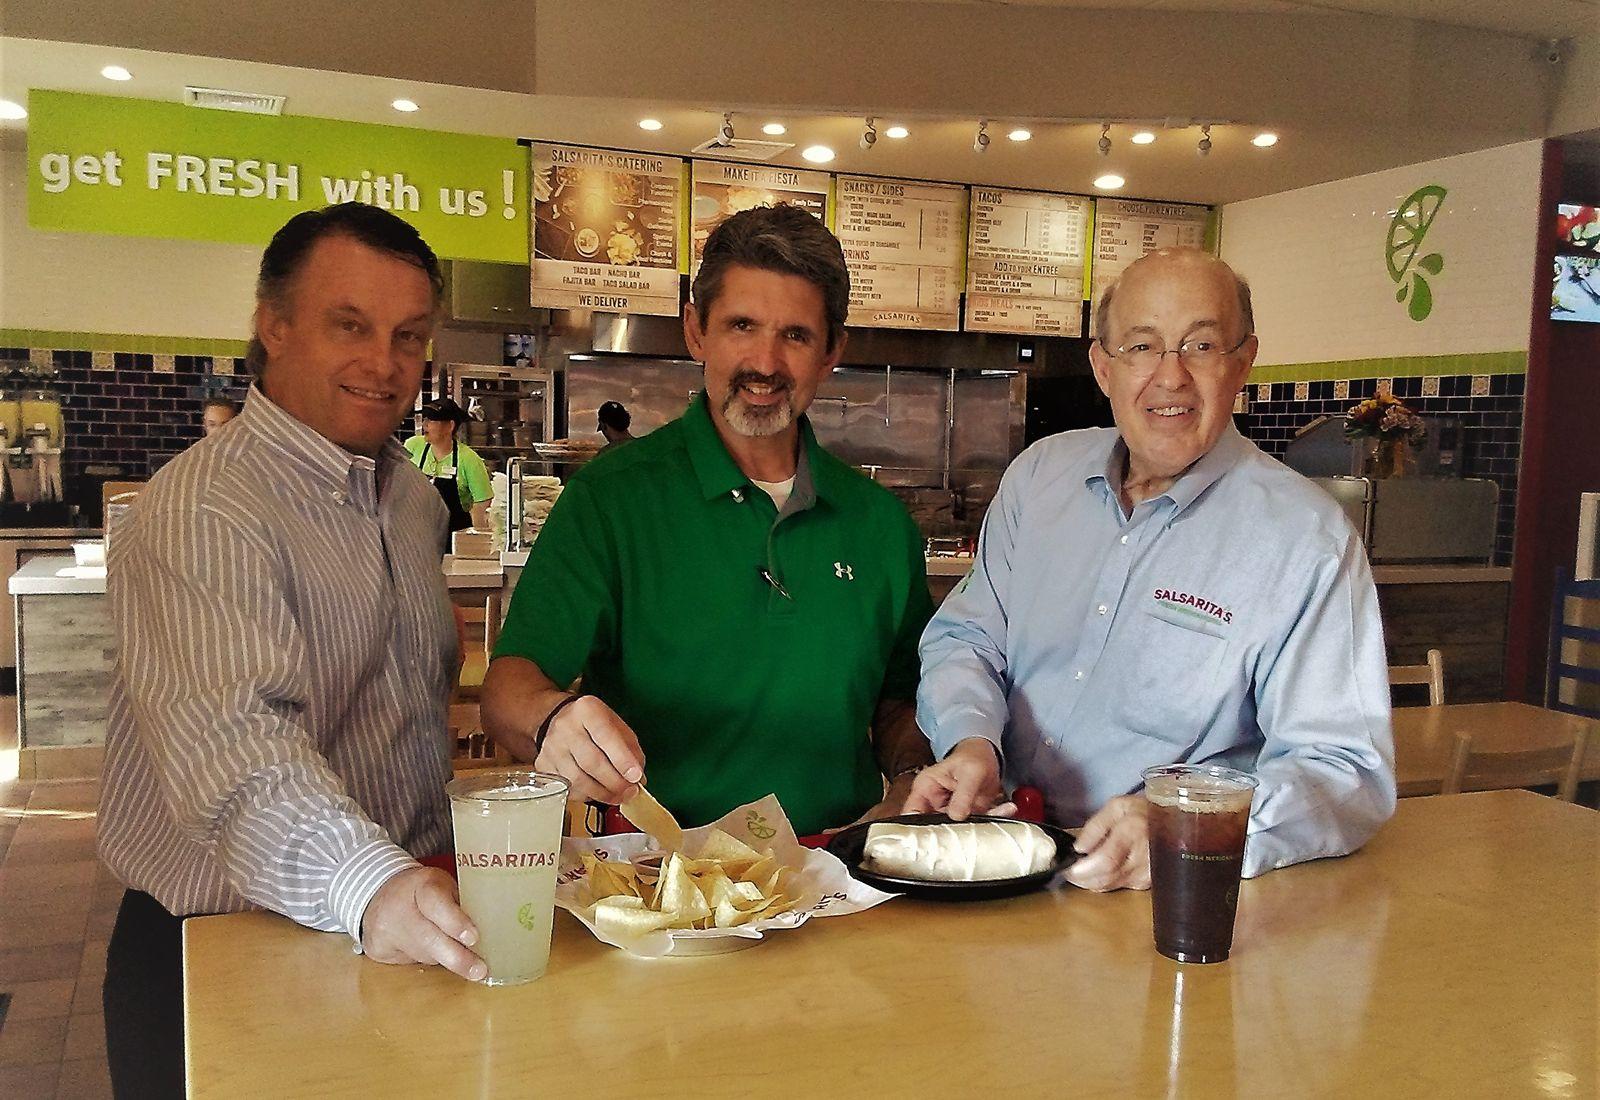 Salsarita's Fresh Mexican Grill Debuts First Drive-Thru Location